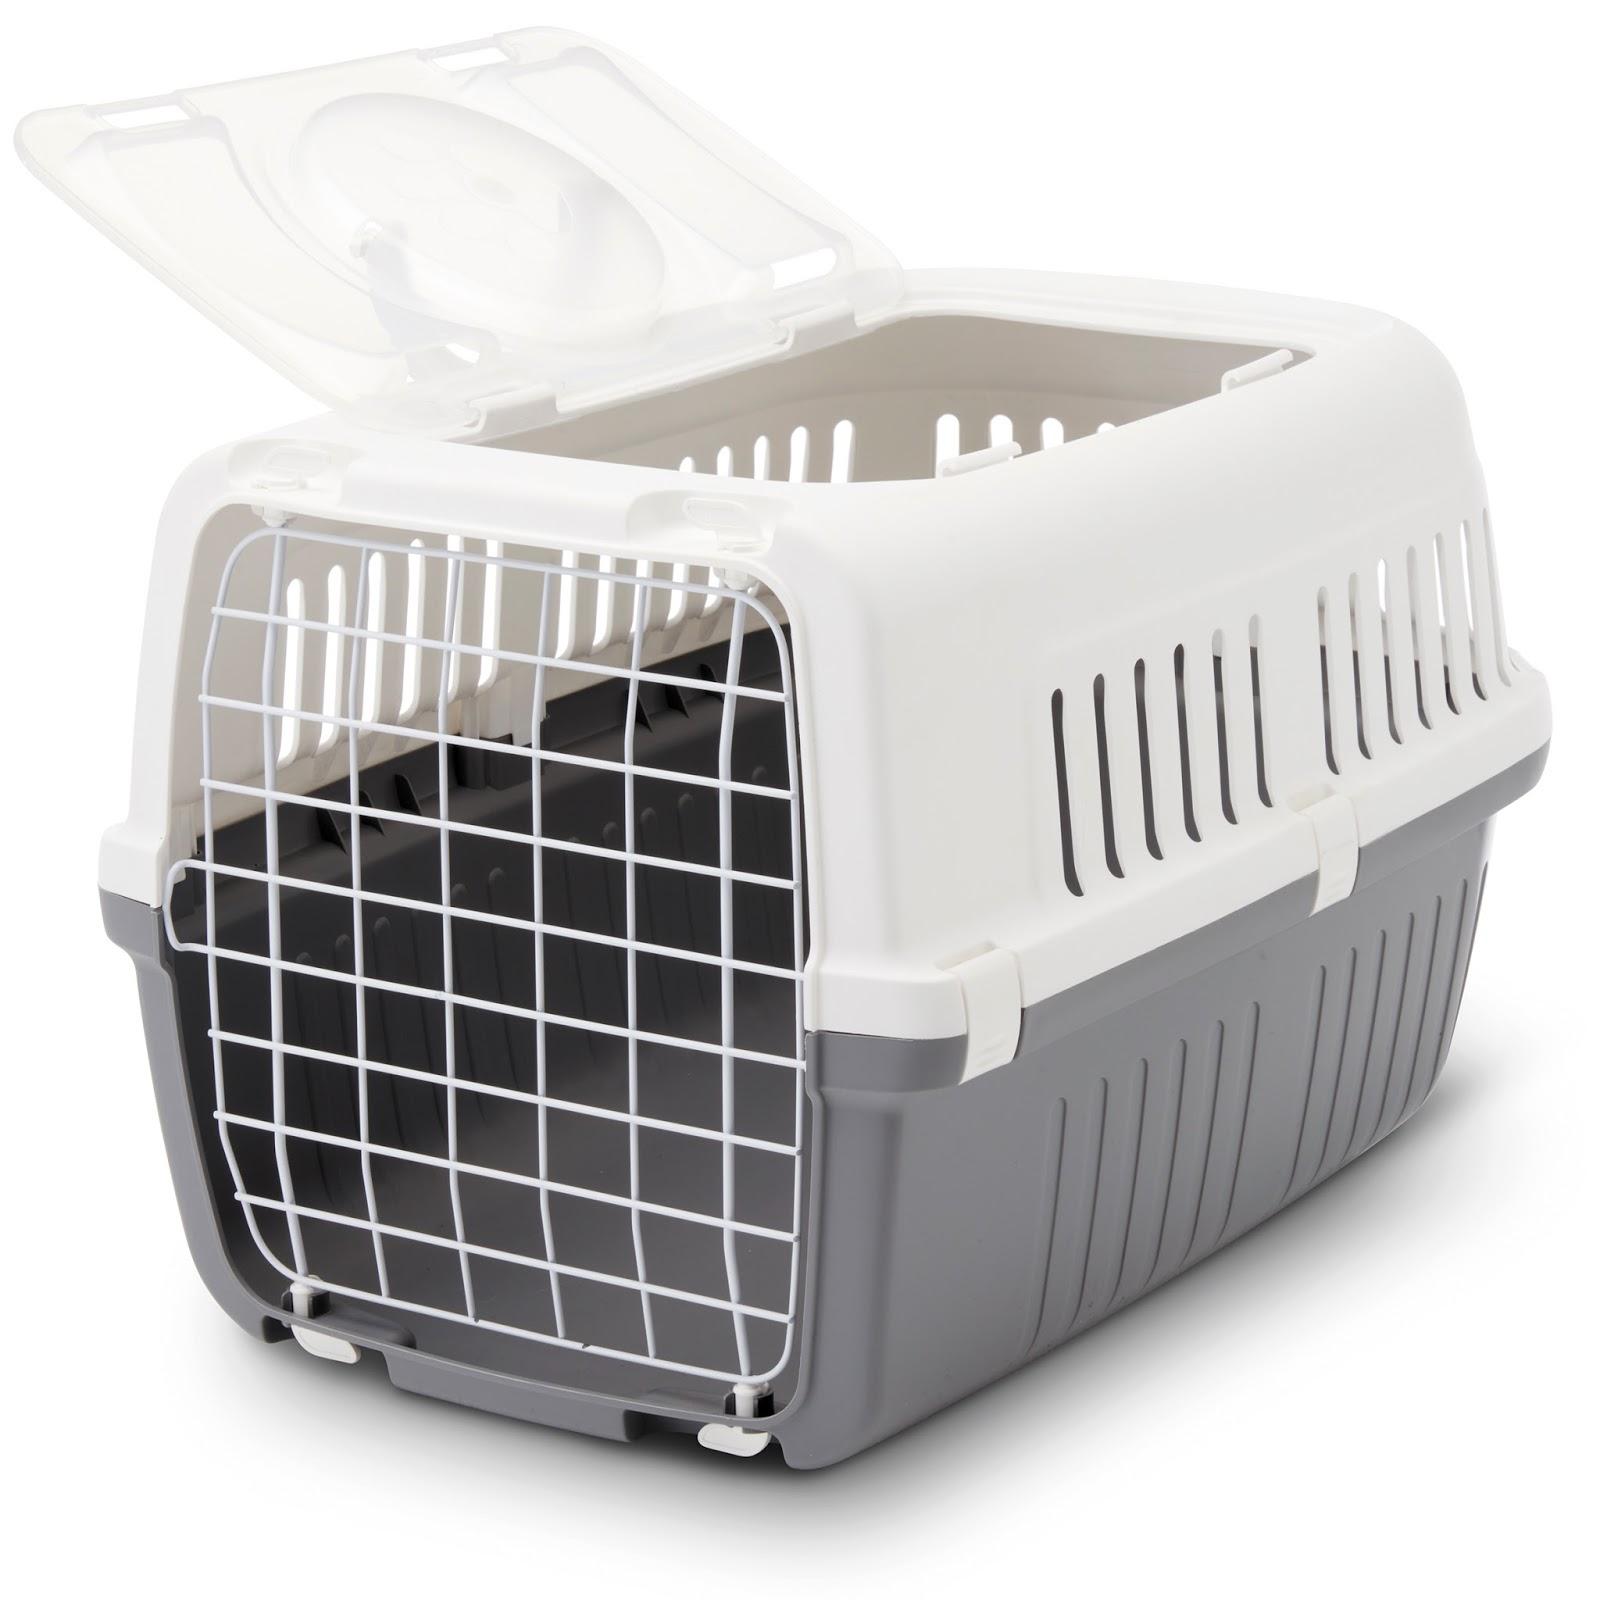 choisir la cage de transport de son chat gamm vert. Black Bedroom Furniture Sets. Home Design Ideas